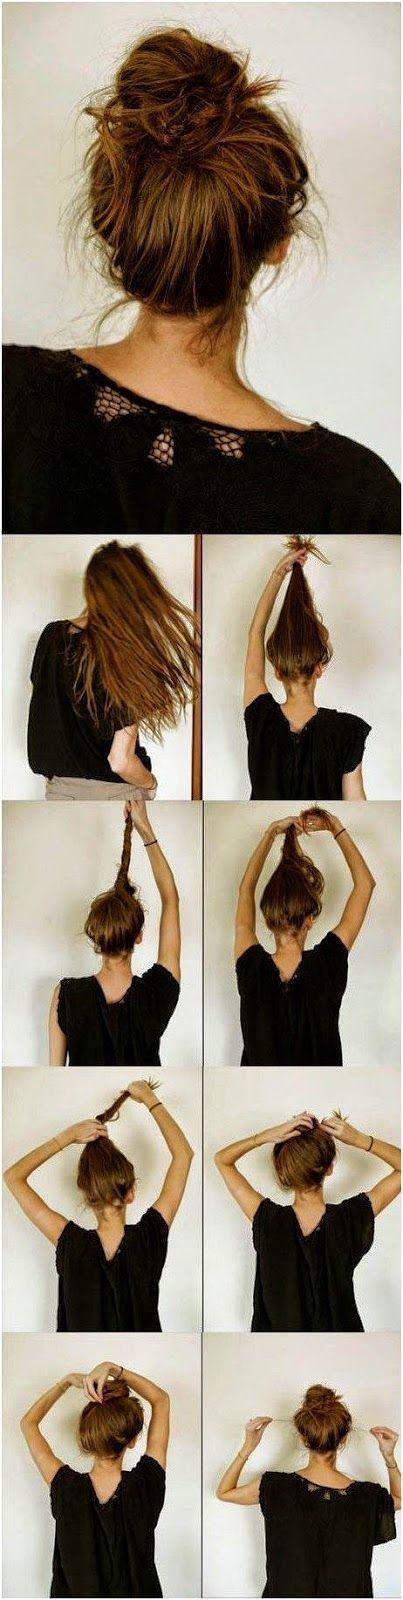 10 Ways To Make Cute Everyday Hairstyles Long Hair Tutorials Popular Haircuts Haircuts Bun Hairstyles For Long Hair Cute Everyday Hairstyles Hair Styles